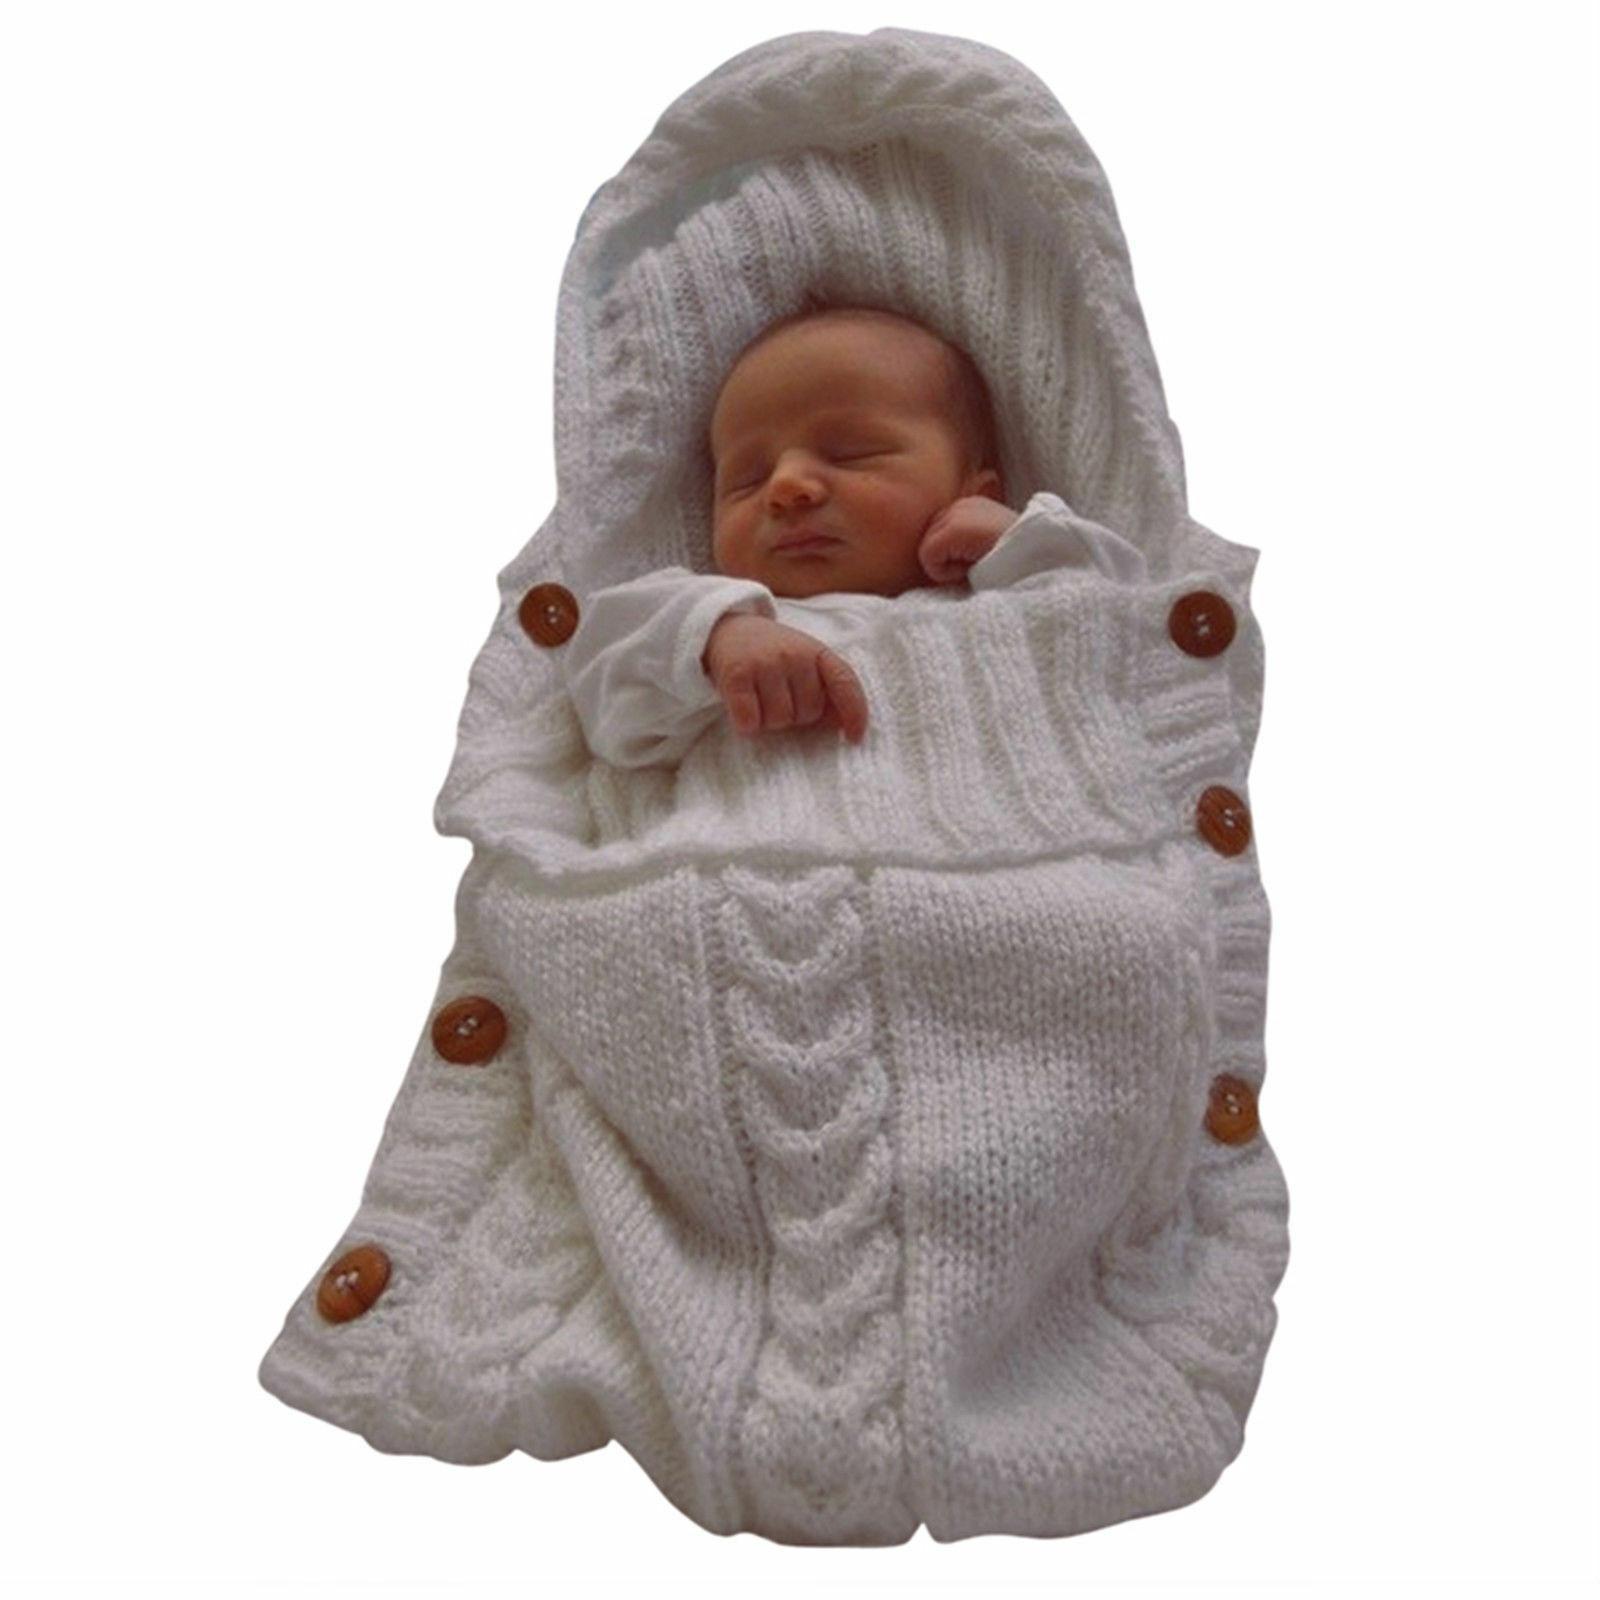 Newborn Baby Infant Knit Crochet Swaddle Blanket Bag